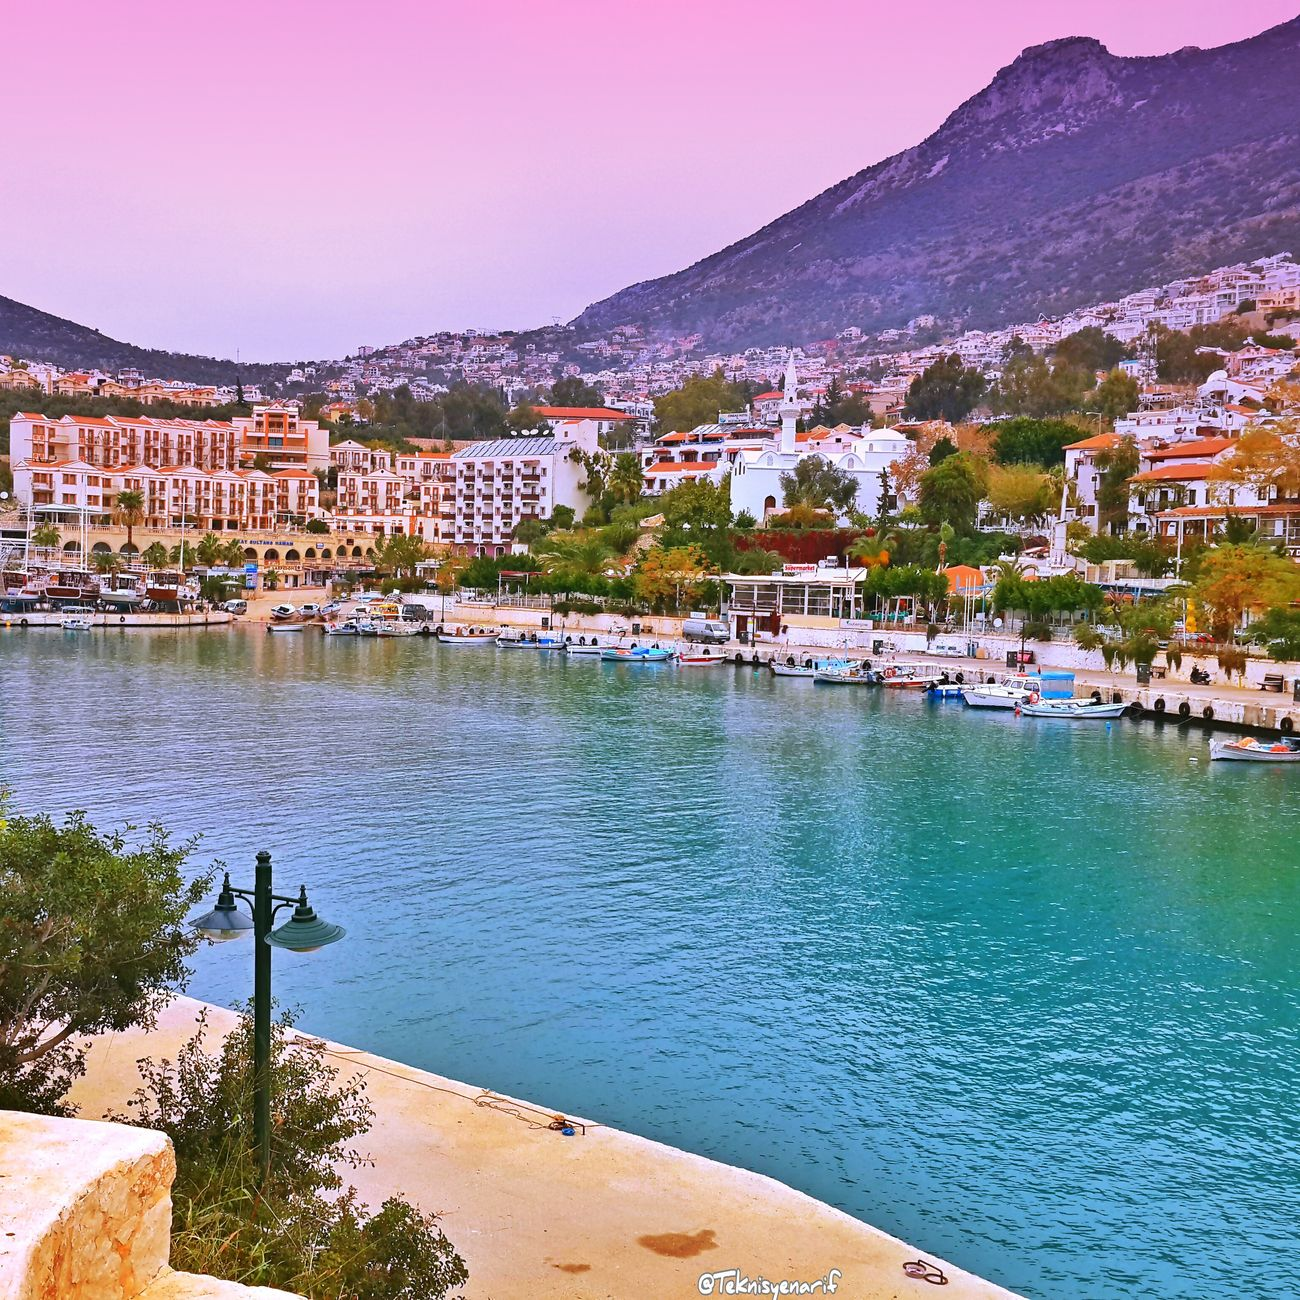 Kalkan marina kaş iyi akşamlar diliyorum herkese Pirat Hotel Kalkan Marina Kas #kalkan #summer #sea #holiday #tatil Marina Kaş-kalkan